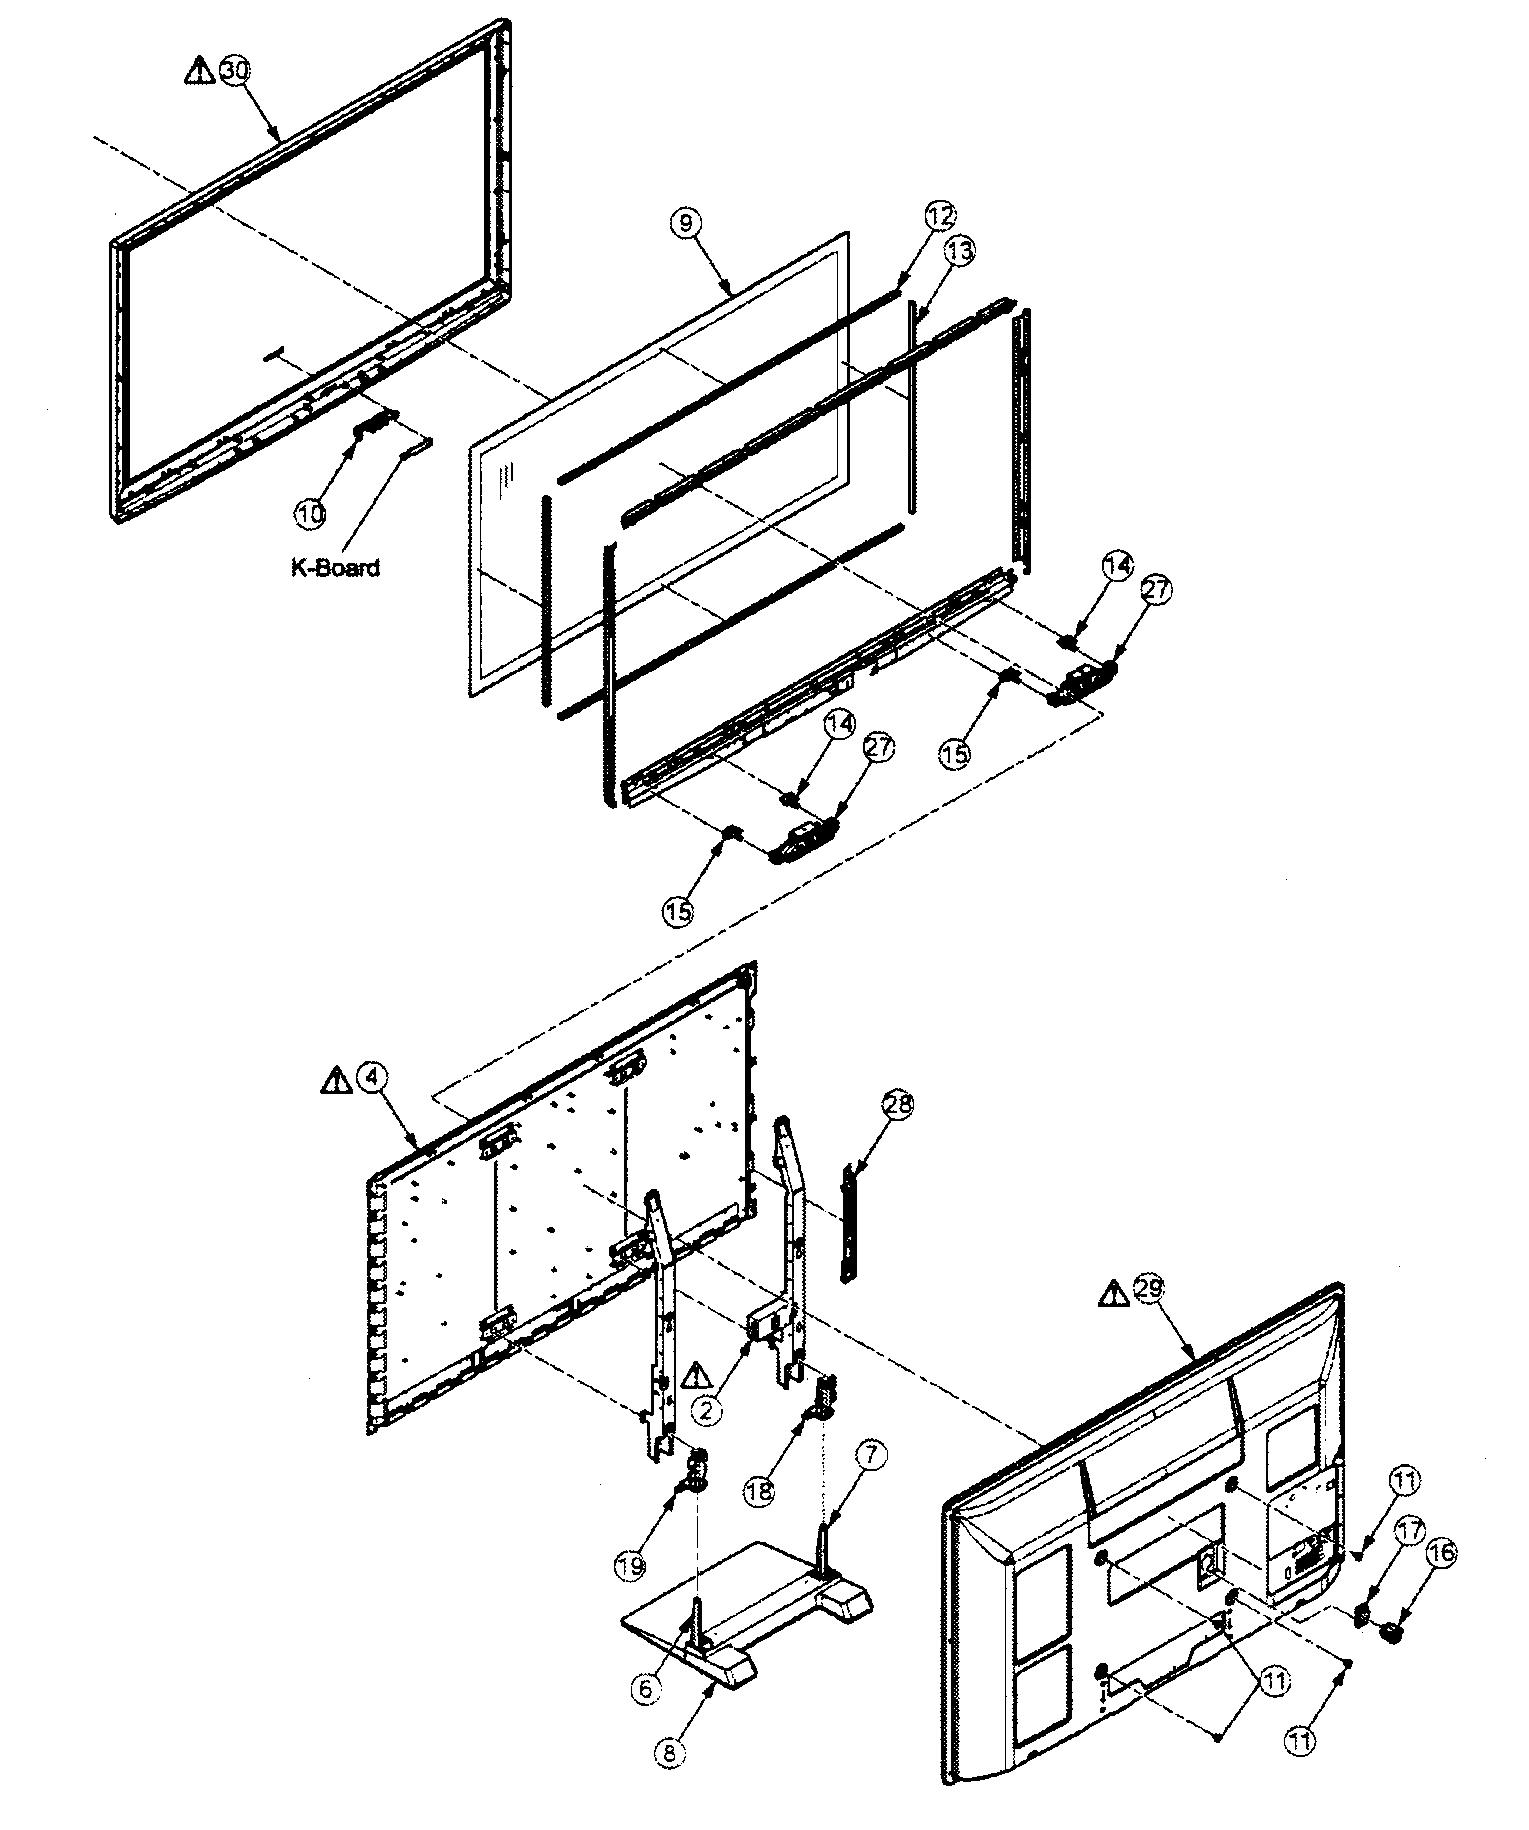 Panasonic model TC-P50S2 plasma television genuine parts